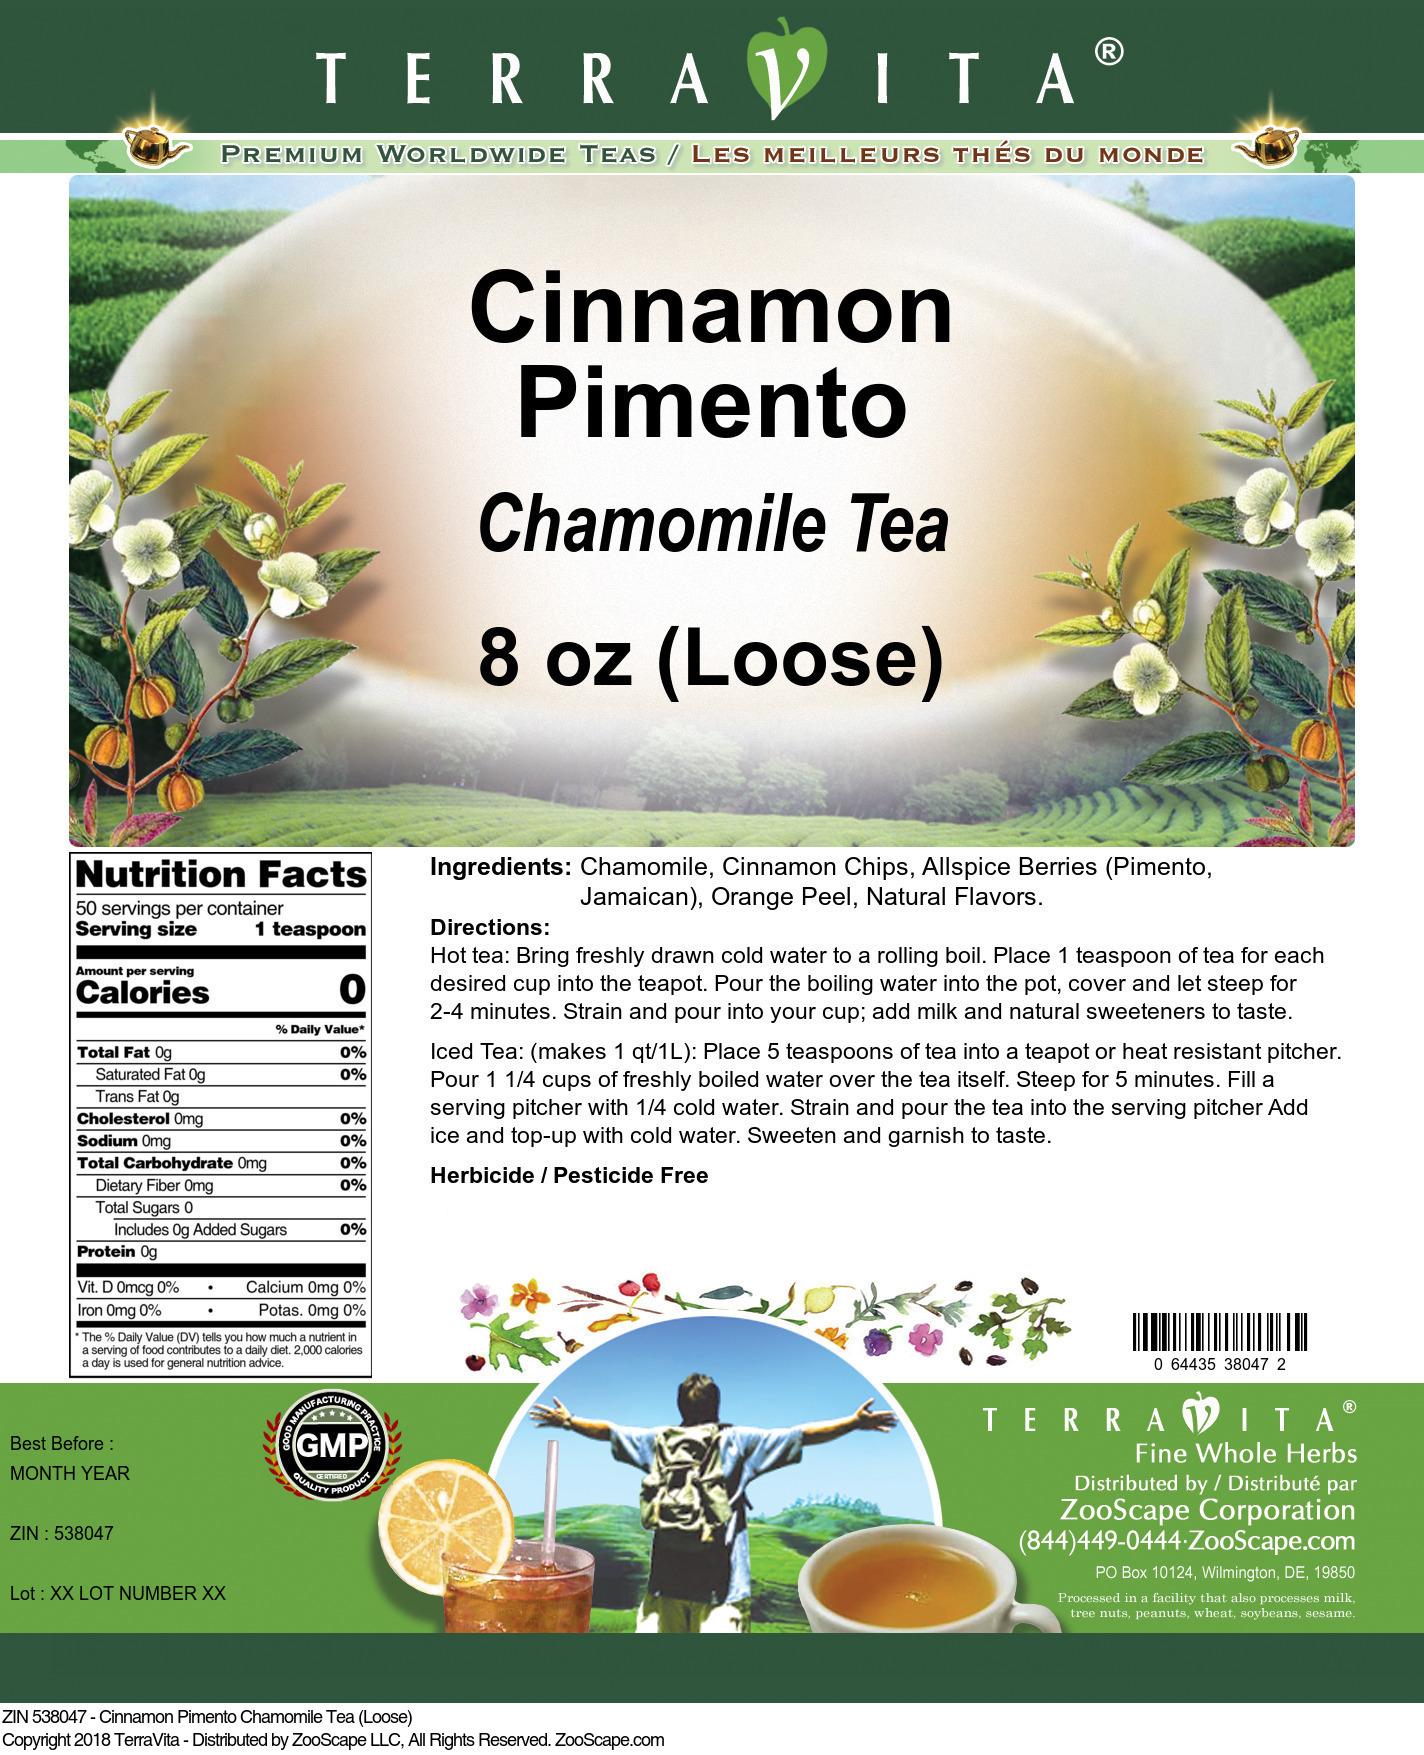 Cinnamon Pimento Chamomile Tea (Loose)